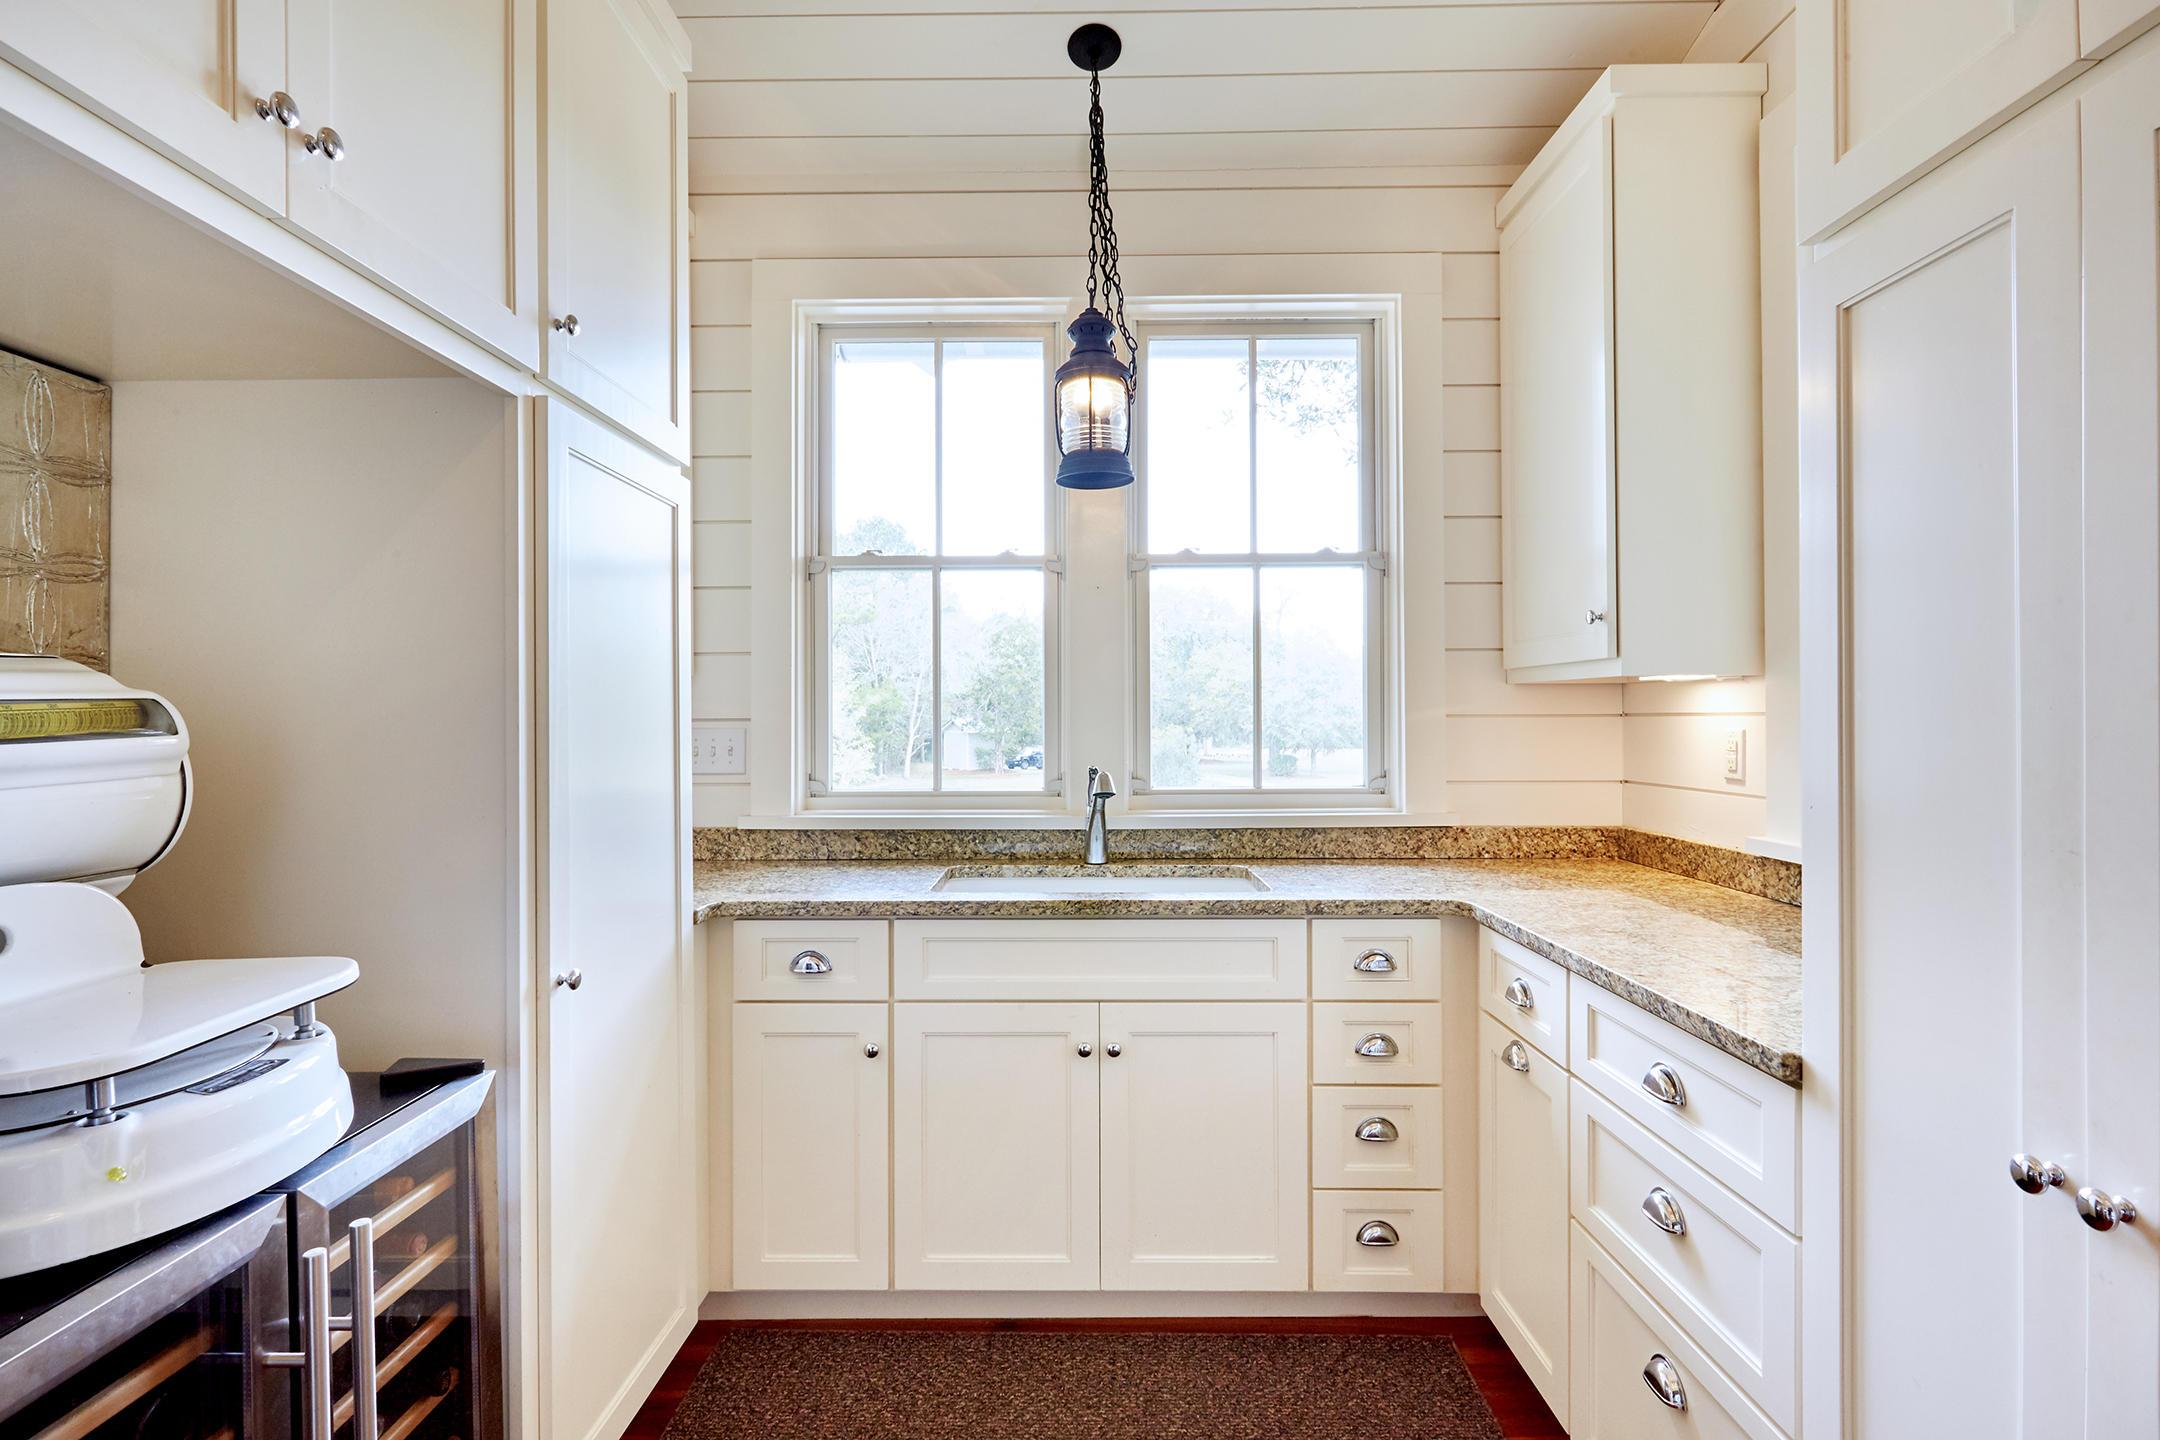 White Stalls Pt Jackson Homes For Sale - 625 Hall, Awendaw, SC - 10